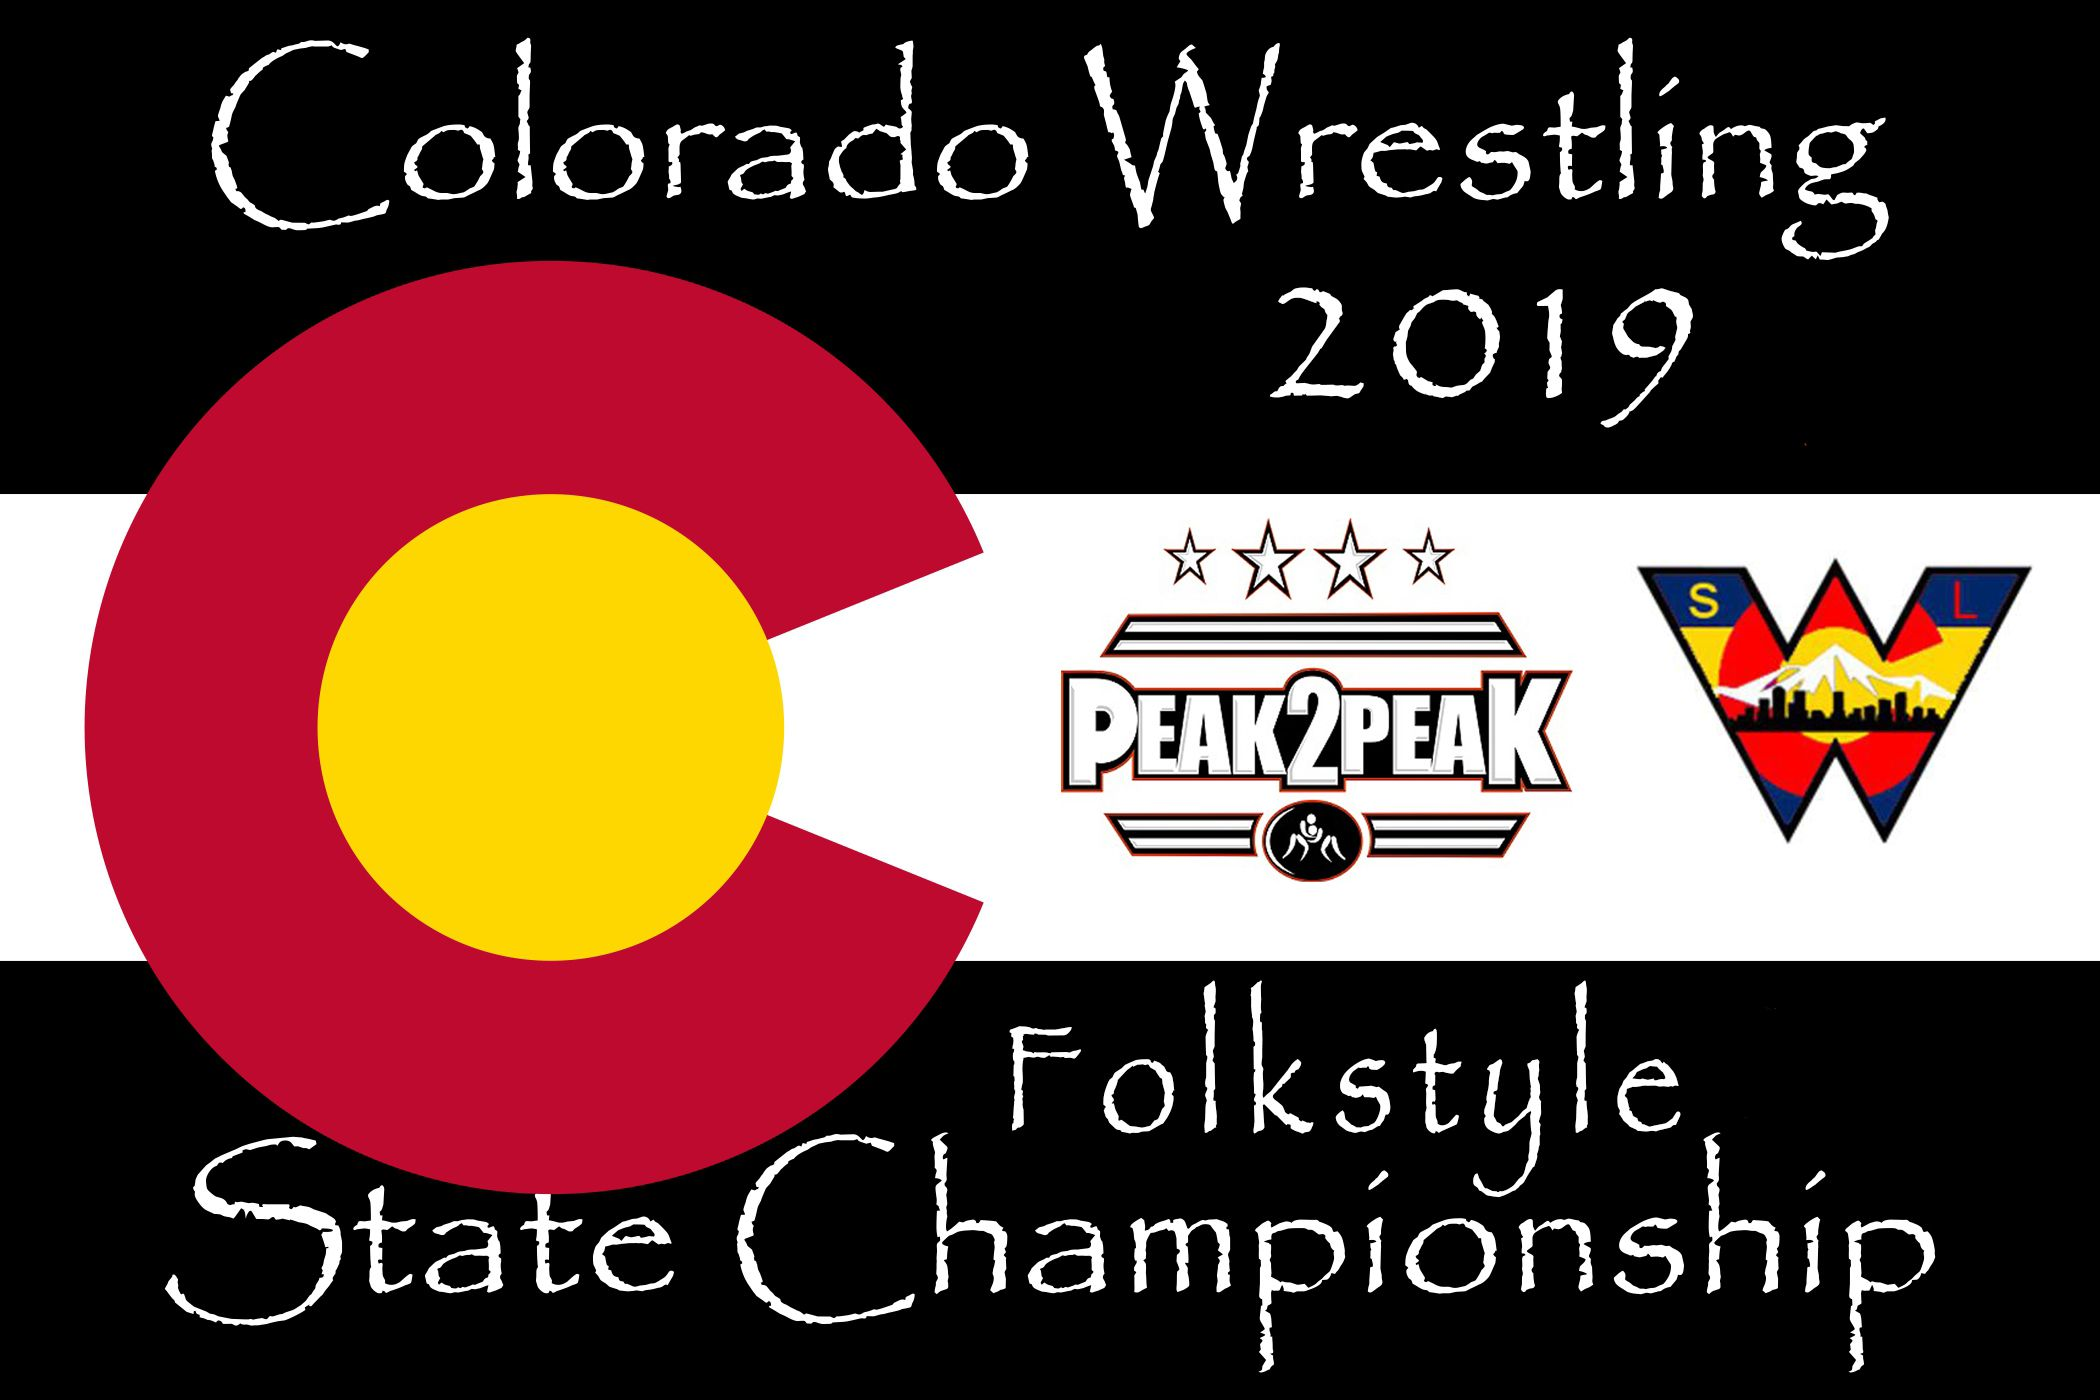 colorado, usa, wrestling, 2019, state championship, wrestling, recap, cousaw, p2p